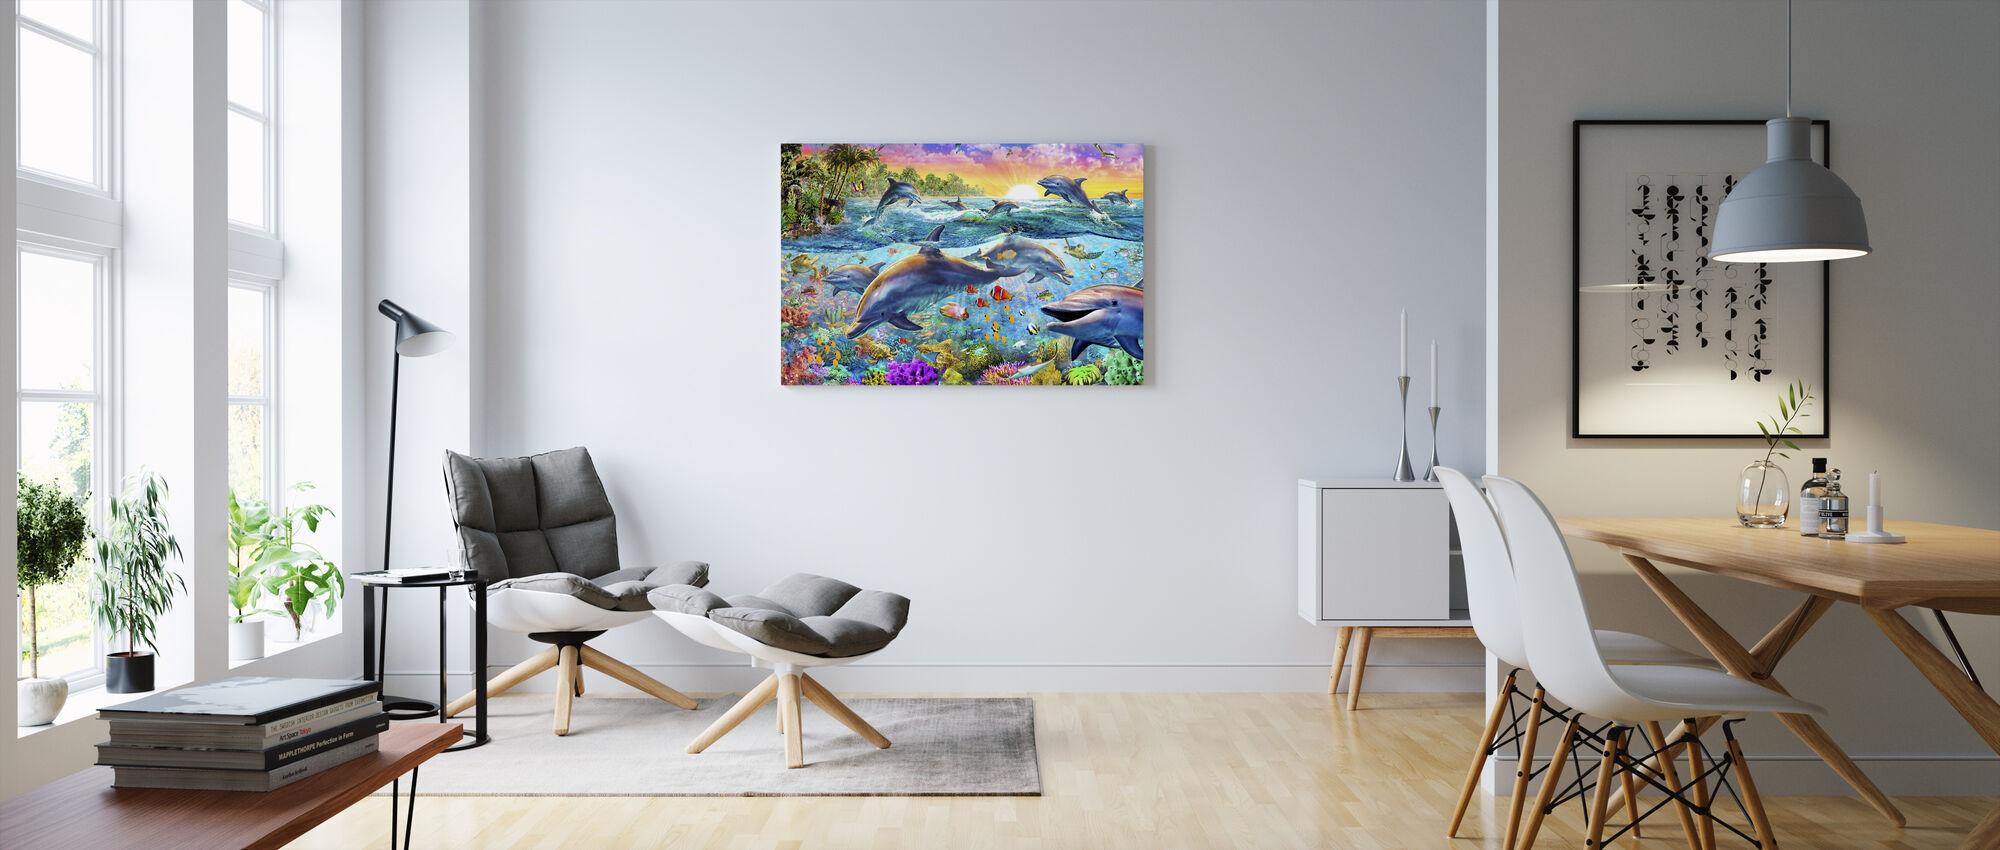 Trooppiset delfiinit - Canvastaulu - Olohuone